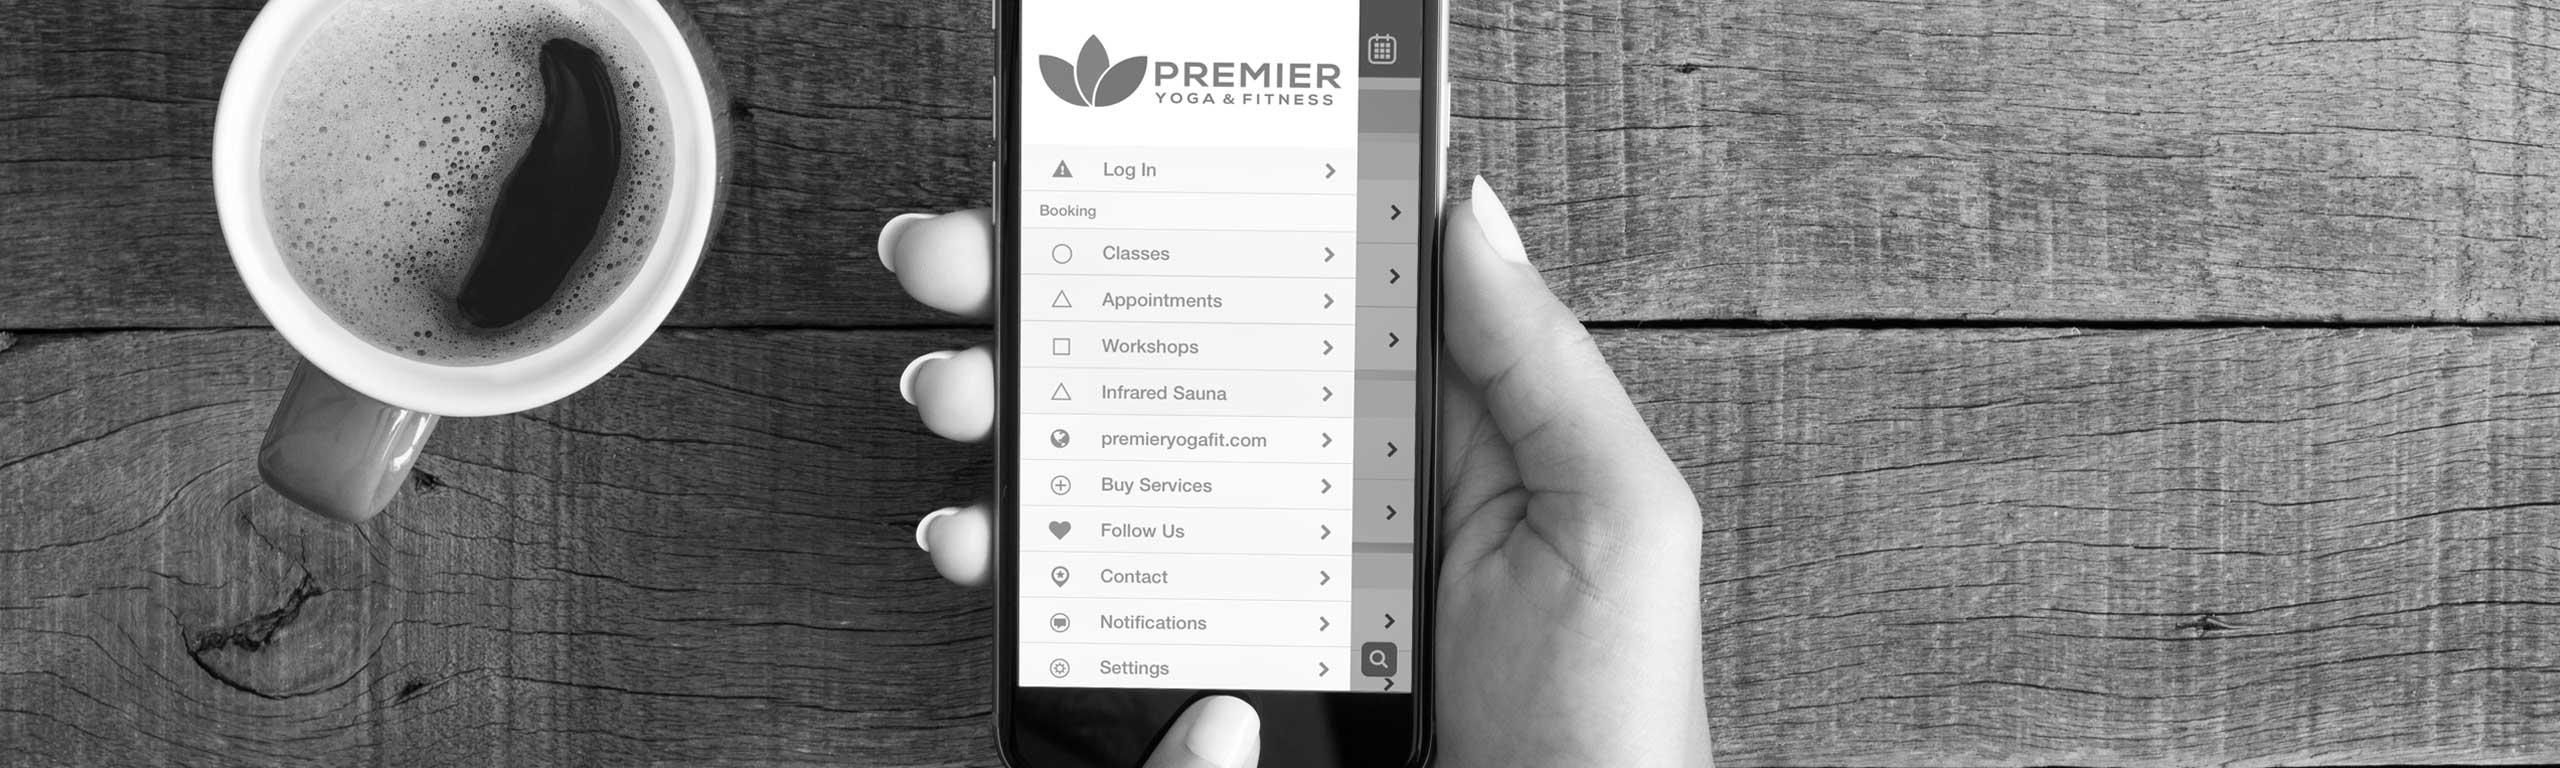 Premier Mobile App